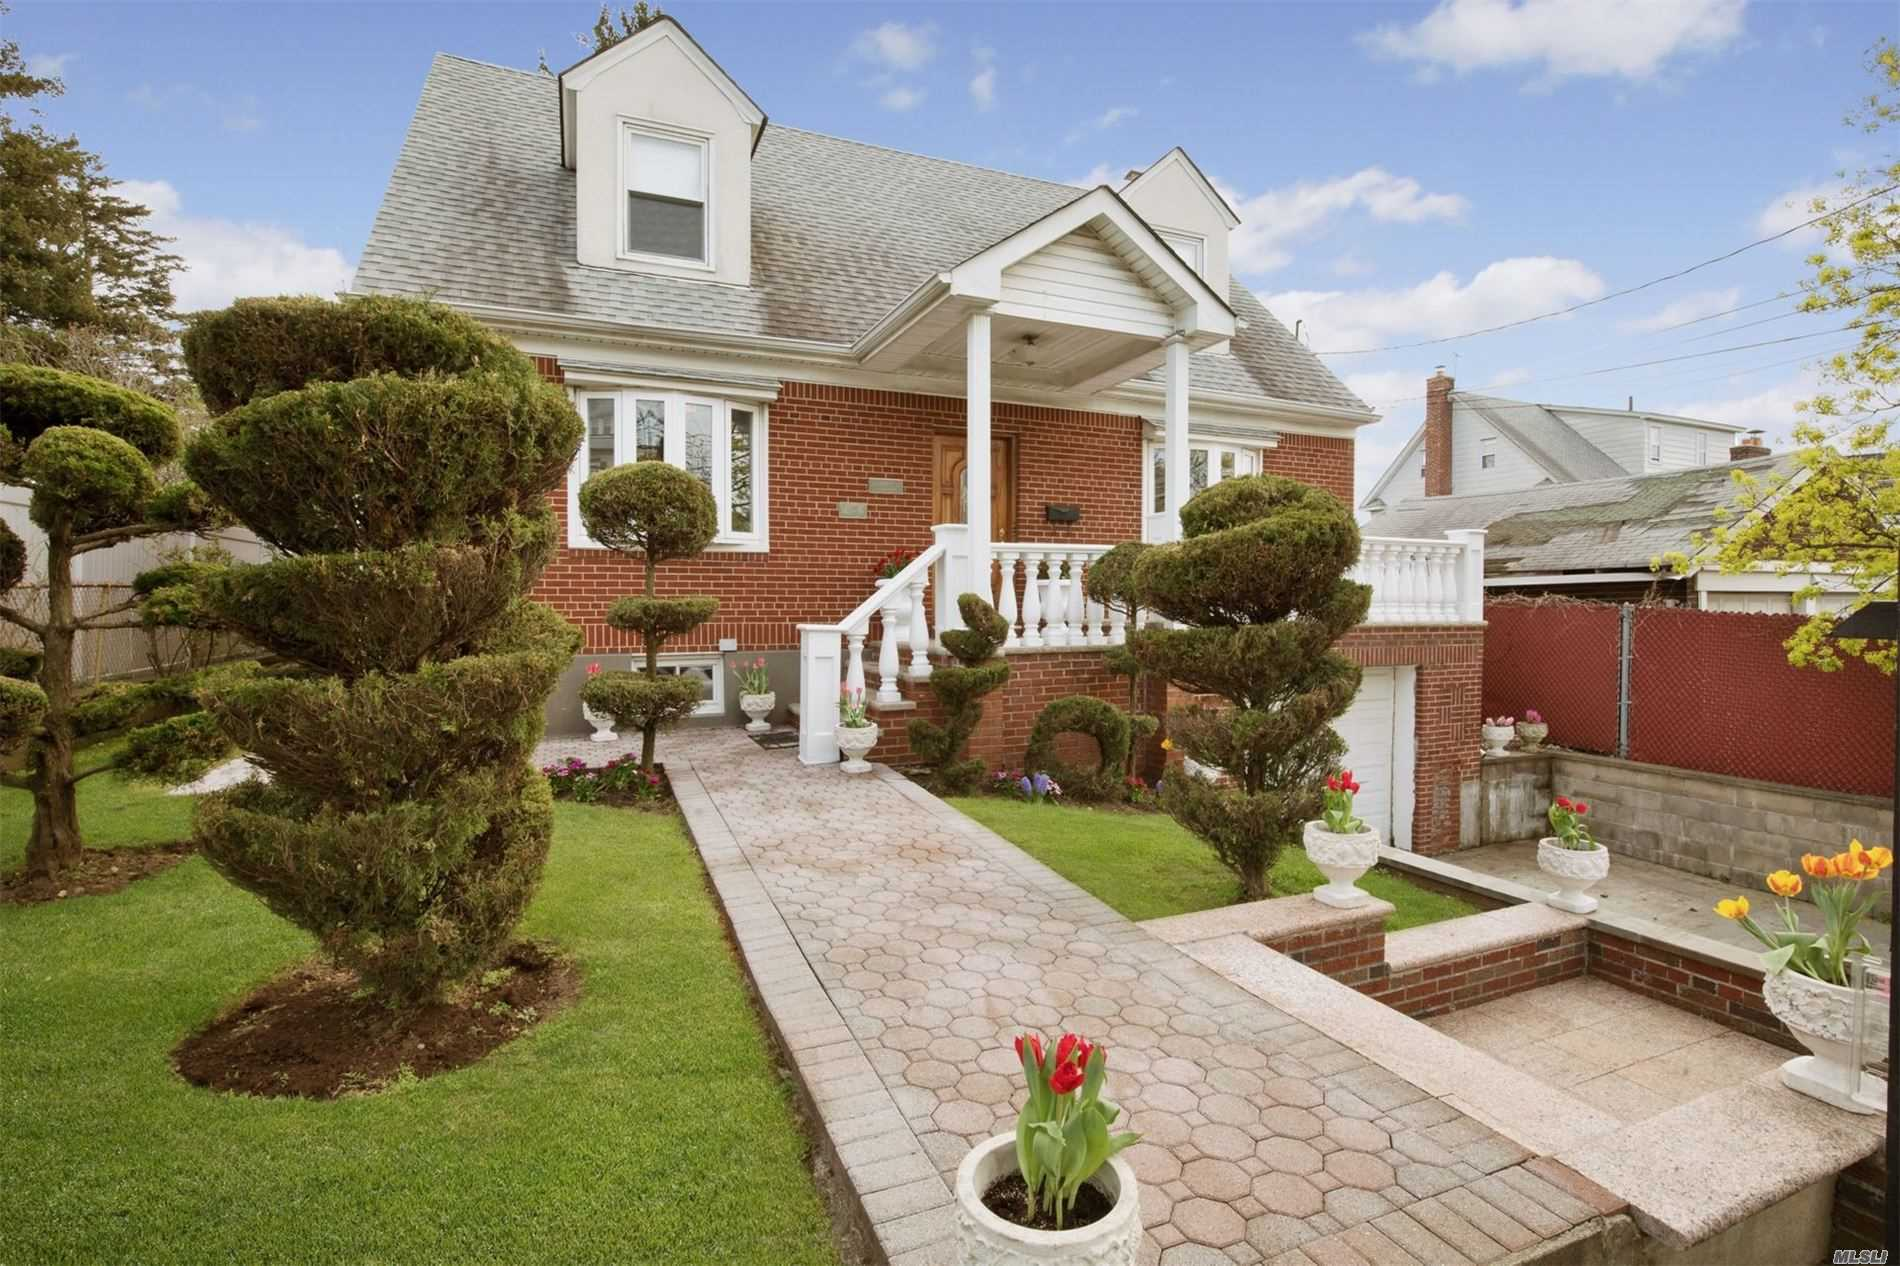 Property for sale at 145-16 19th Avenue, Whitestone NY 11357, Whitestone,  New York 11357